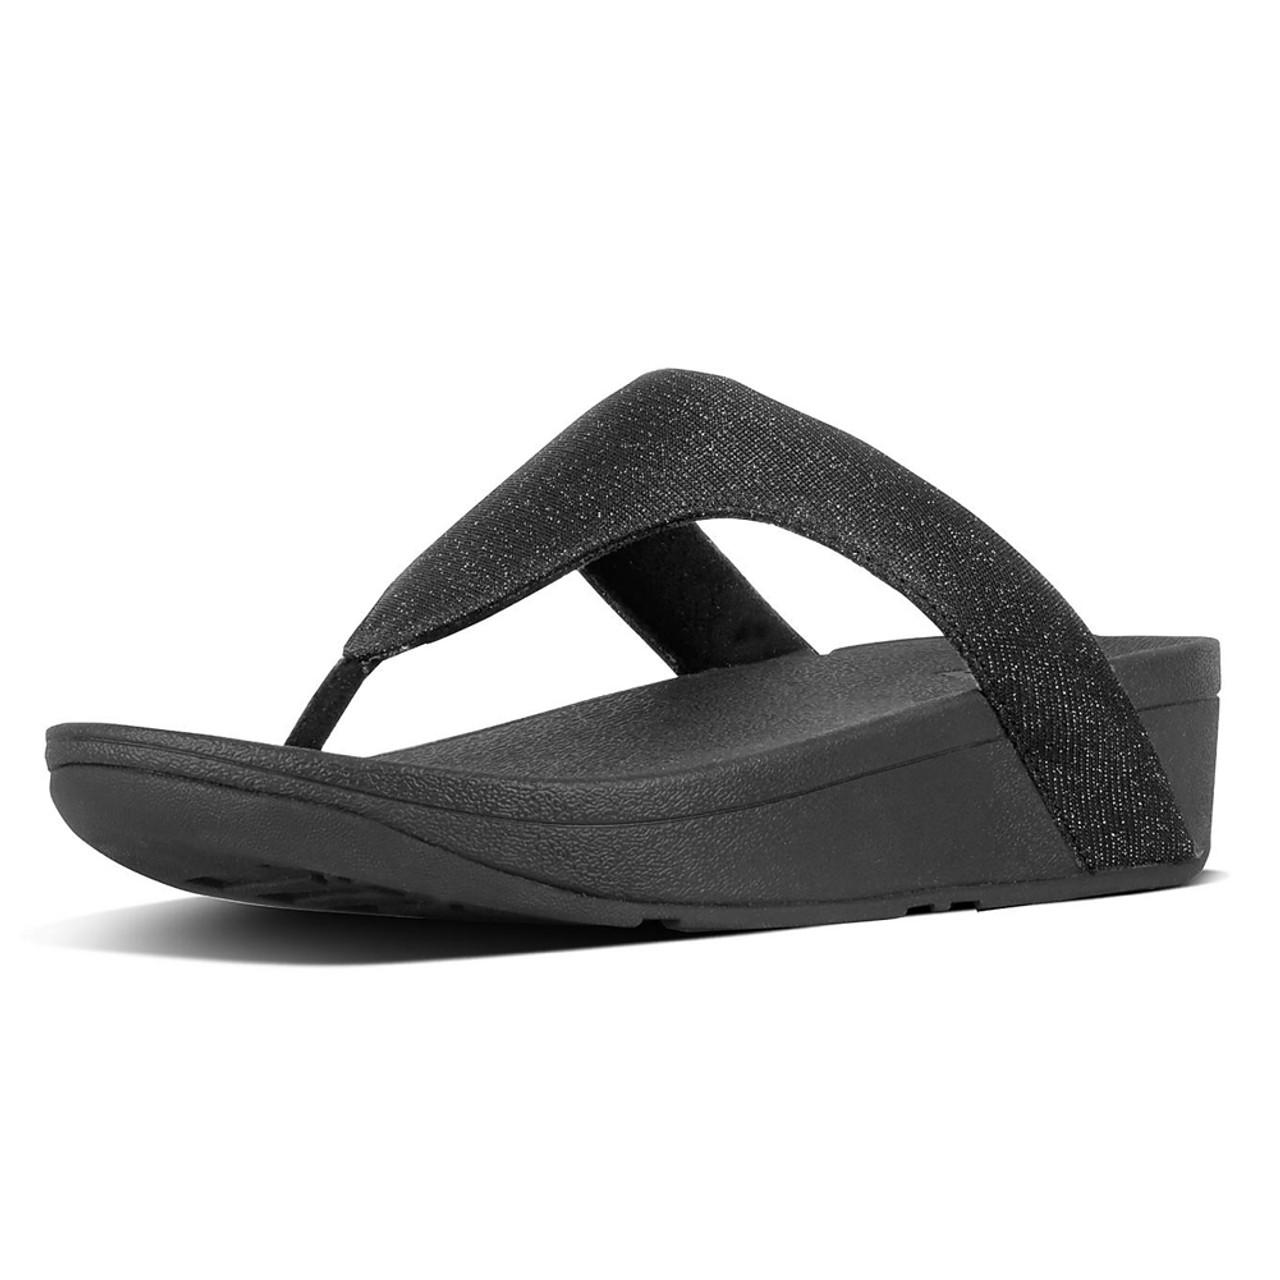 a50dfa80b Fitflop Women s Lottie Glitzy Thong Sandal Black - Shop now   Shoolu.com